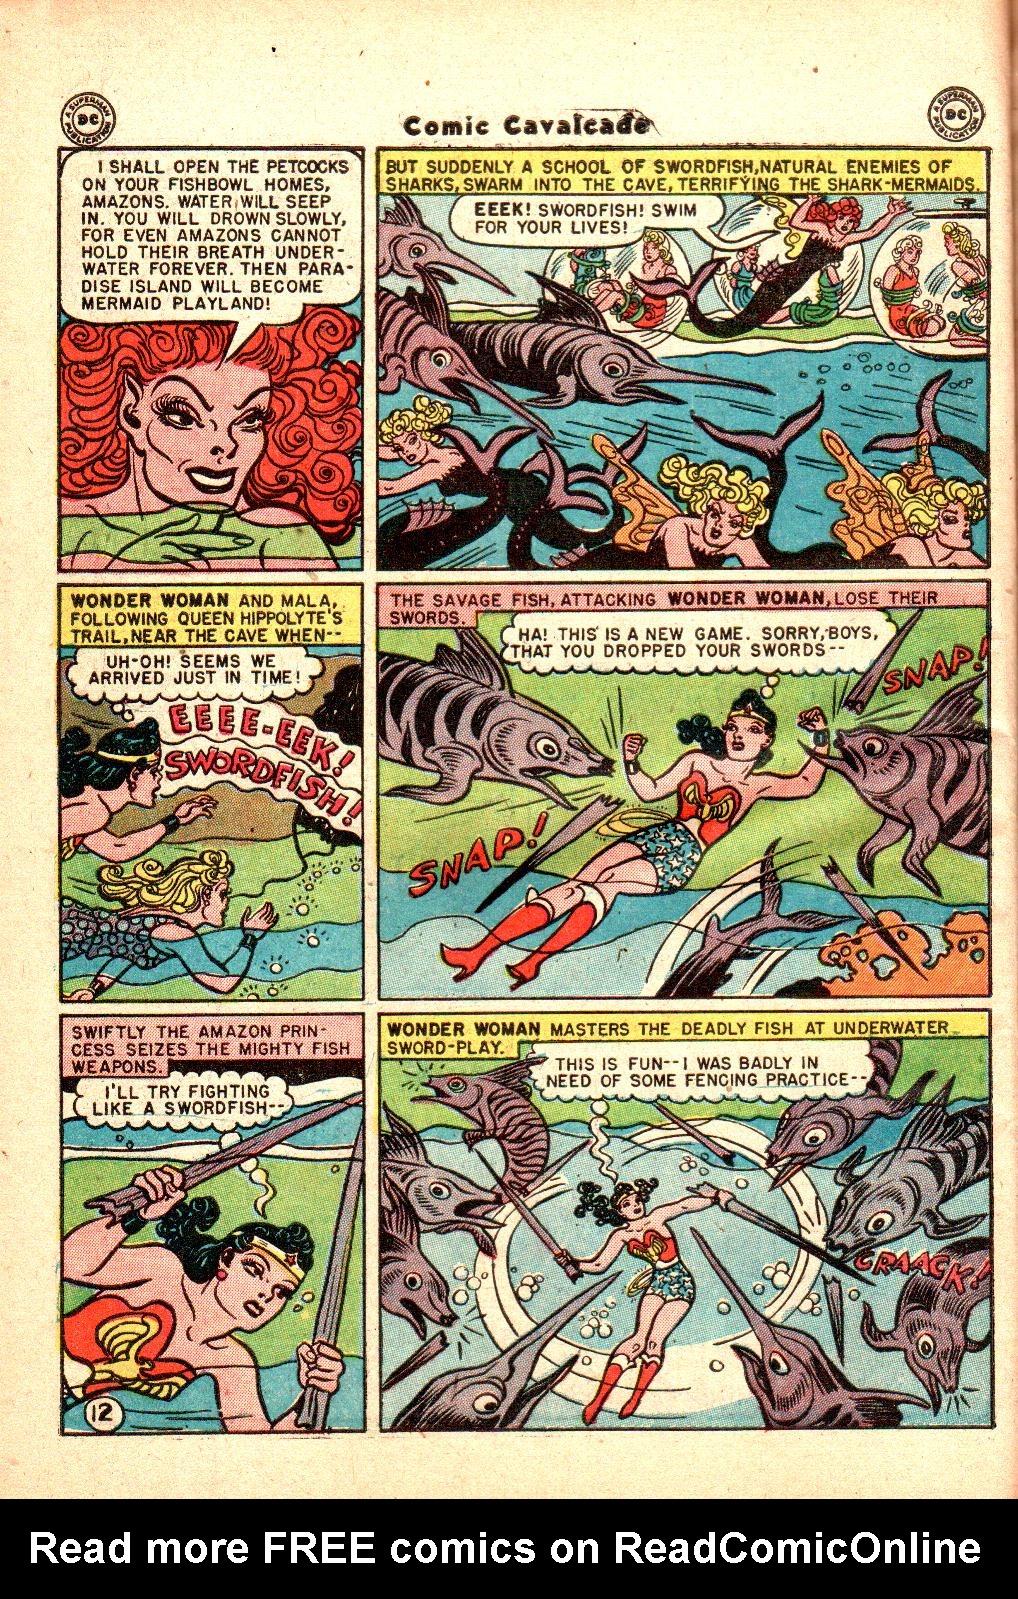 Comic Cavalcade issue 21 - Page 14